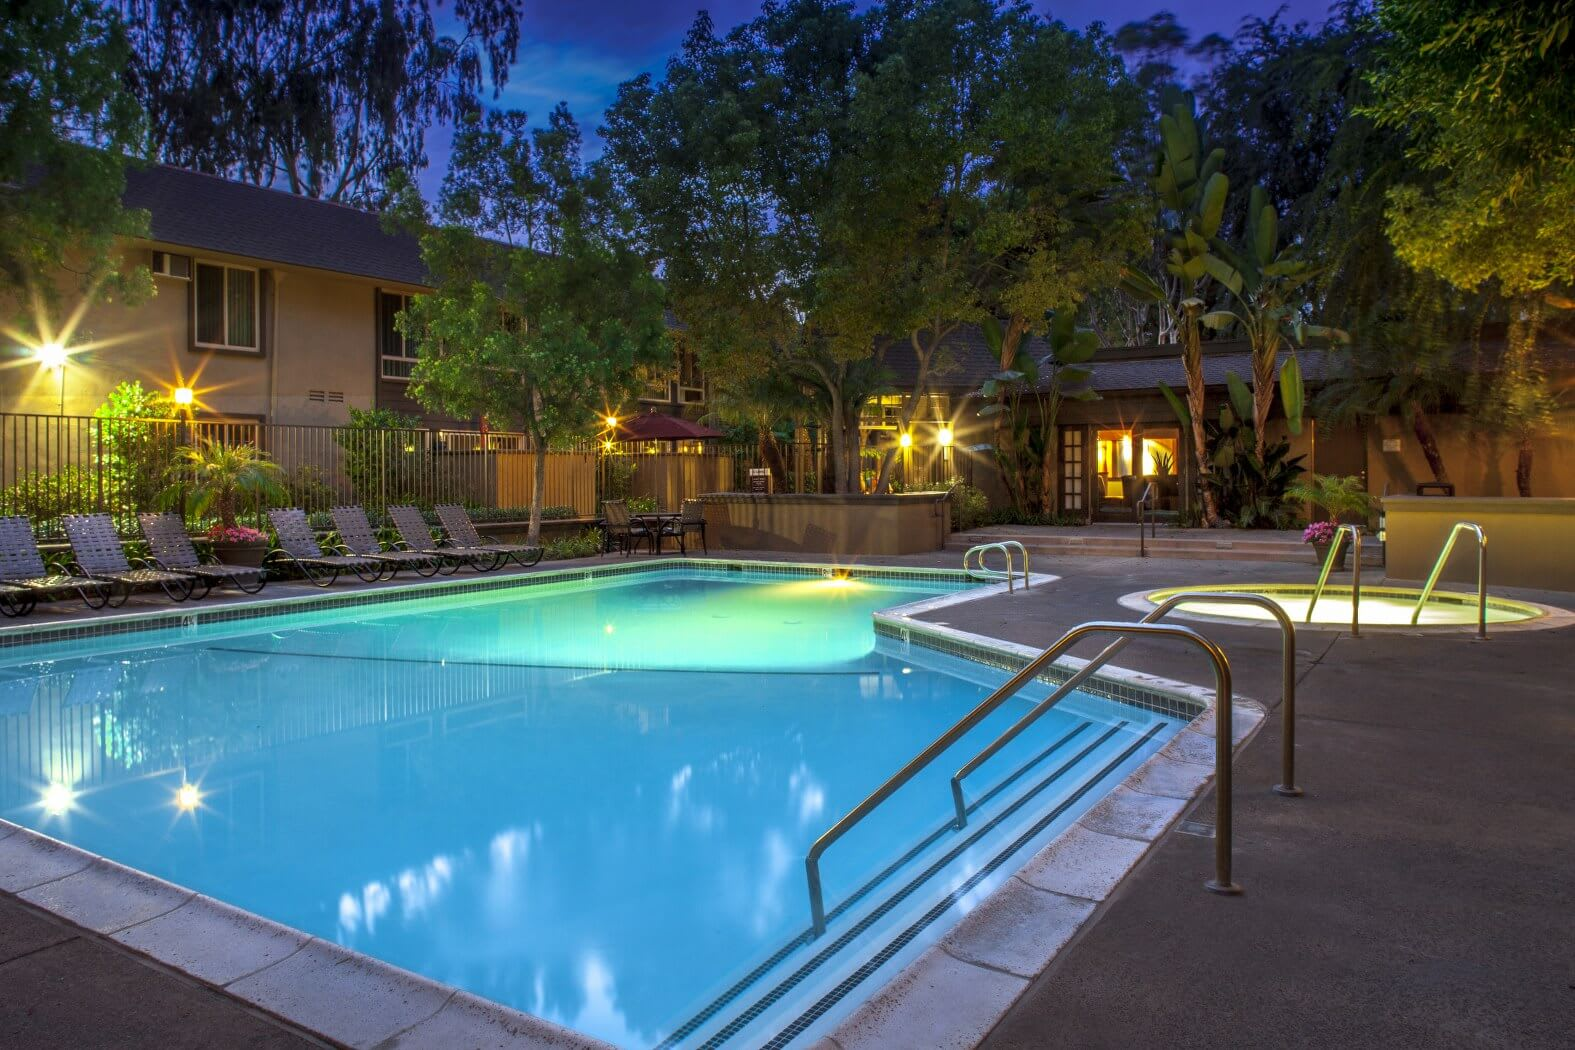 View of Sparkling Pool at Hills at Hacienda Heights, Hacienda Heights, CA, 91745